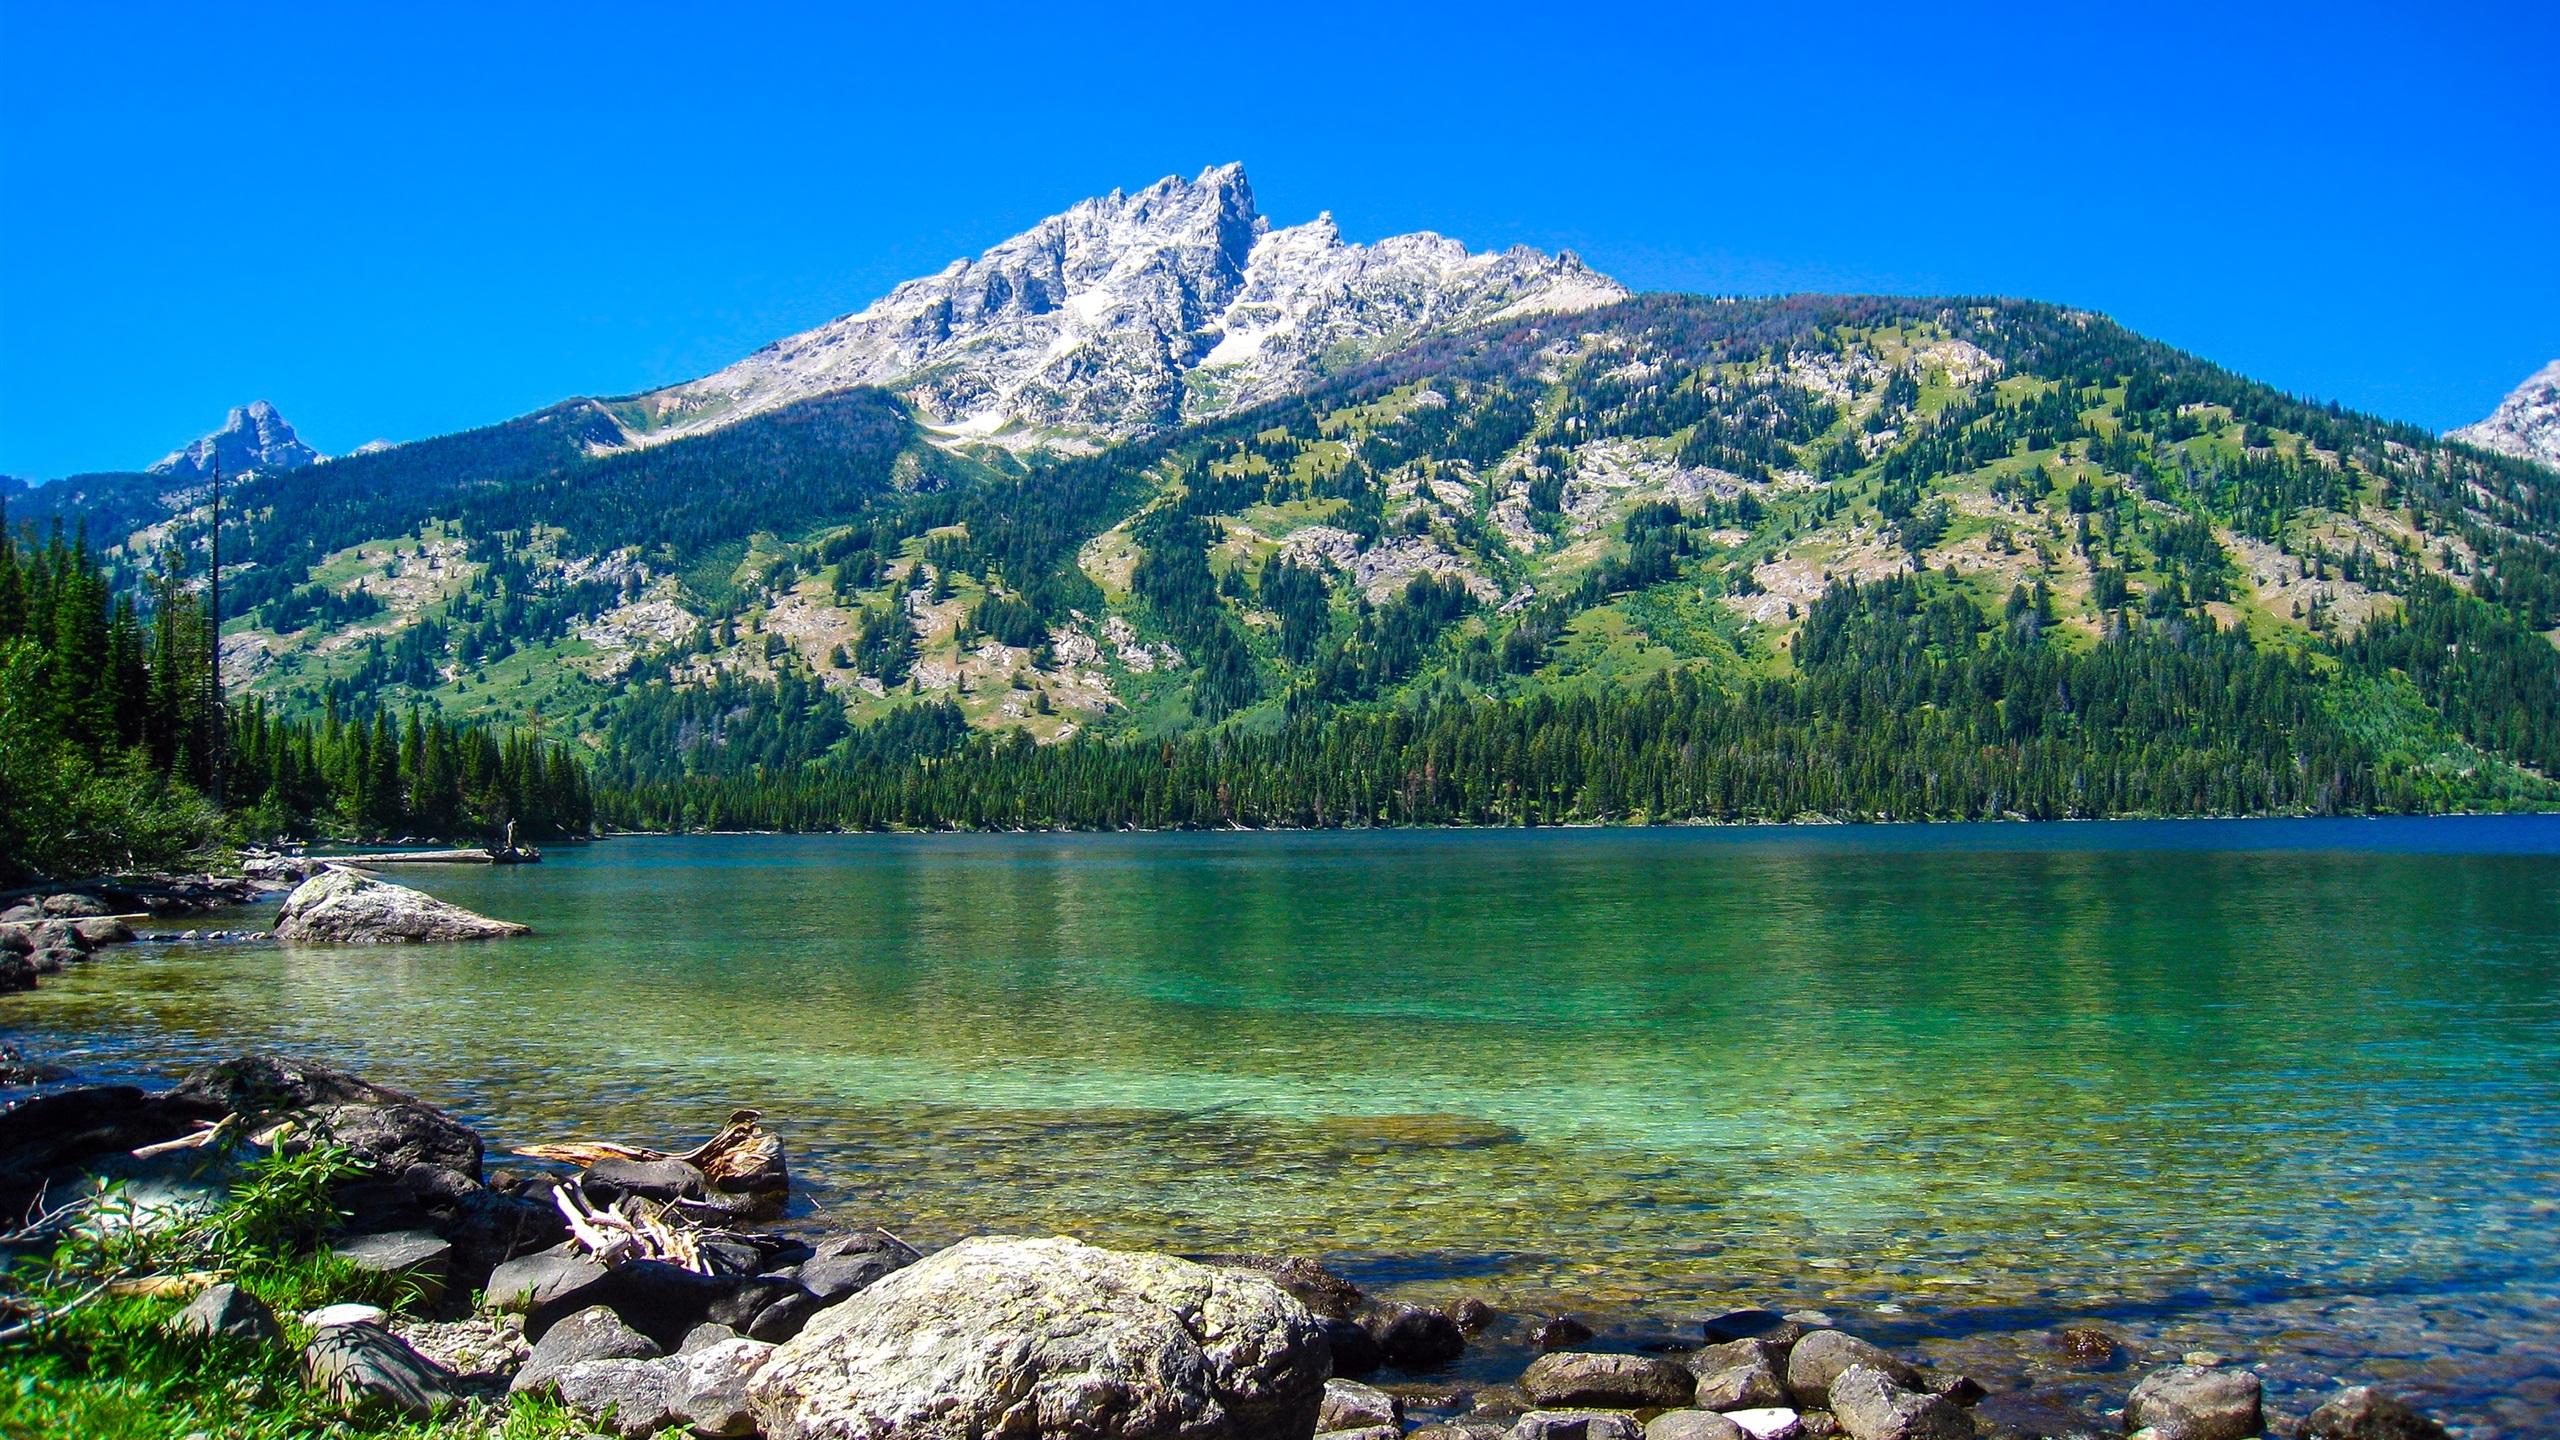 Download Wallpaper 2560x1440 Emerald Lake, Grand Teton National Park, Wyoming, USA, mountains ...